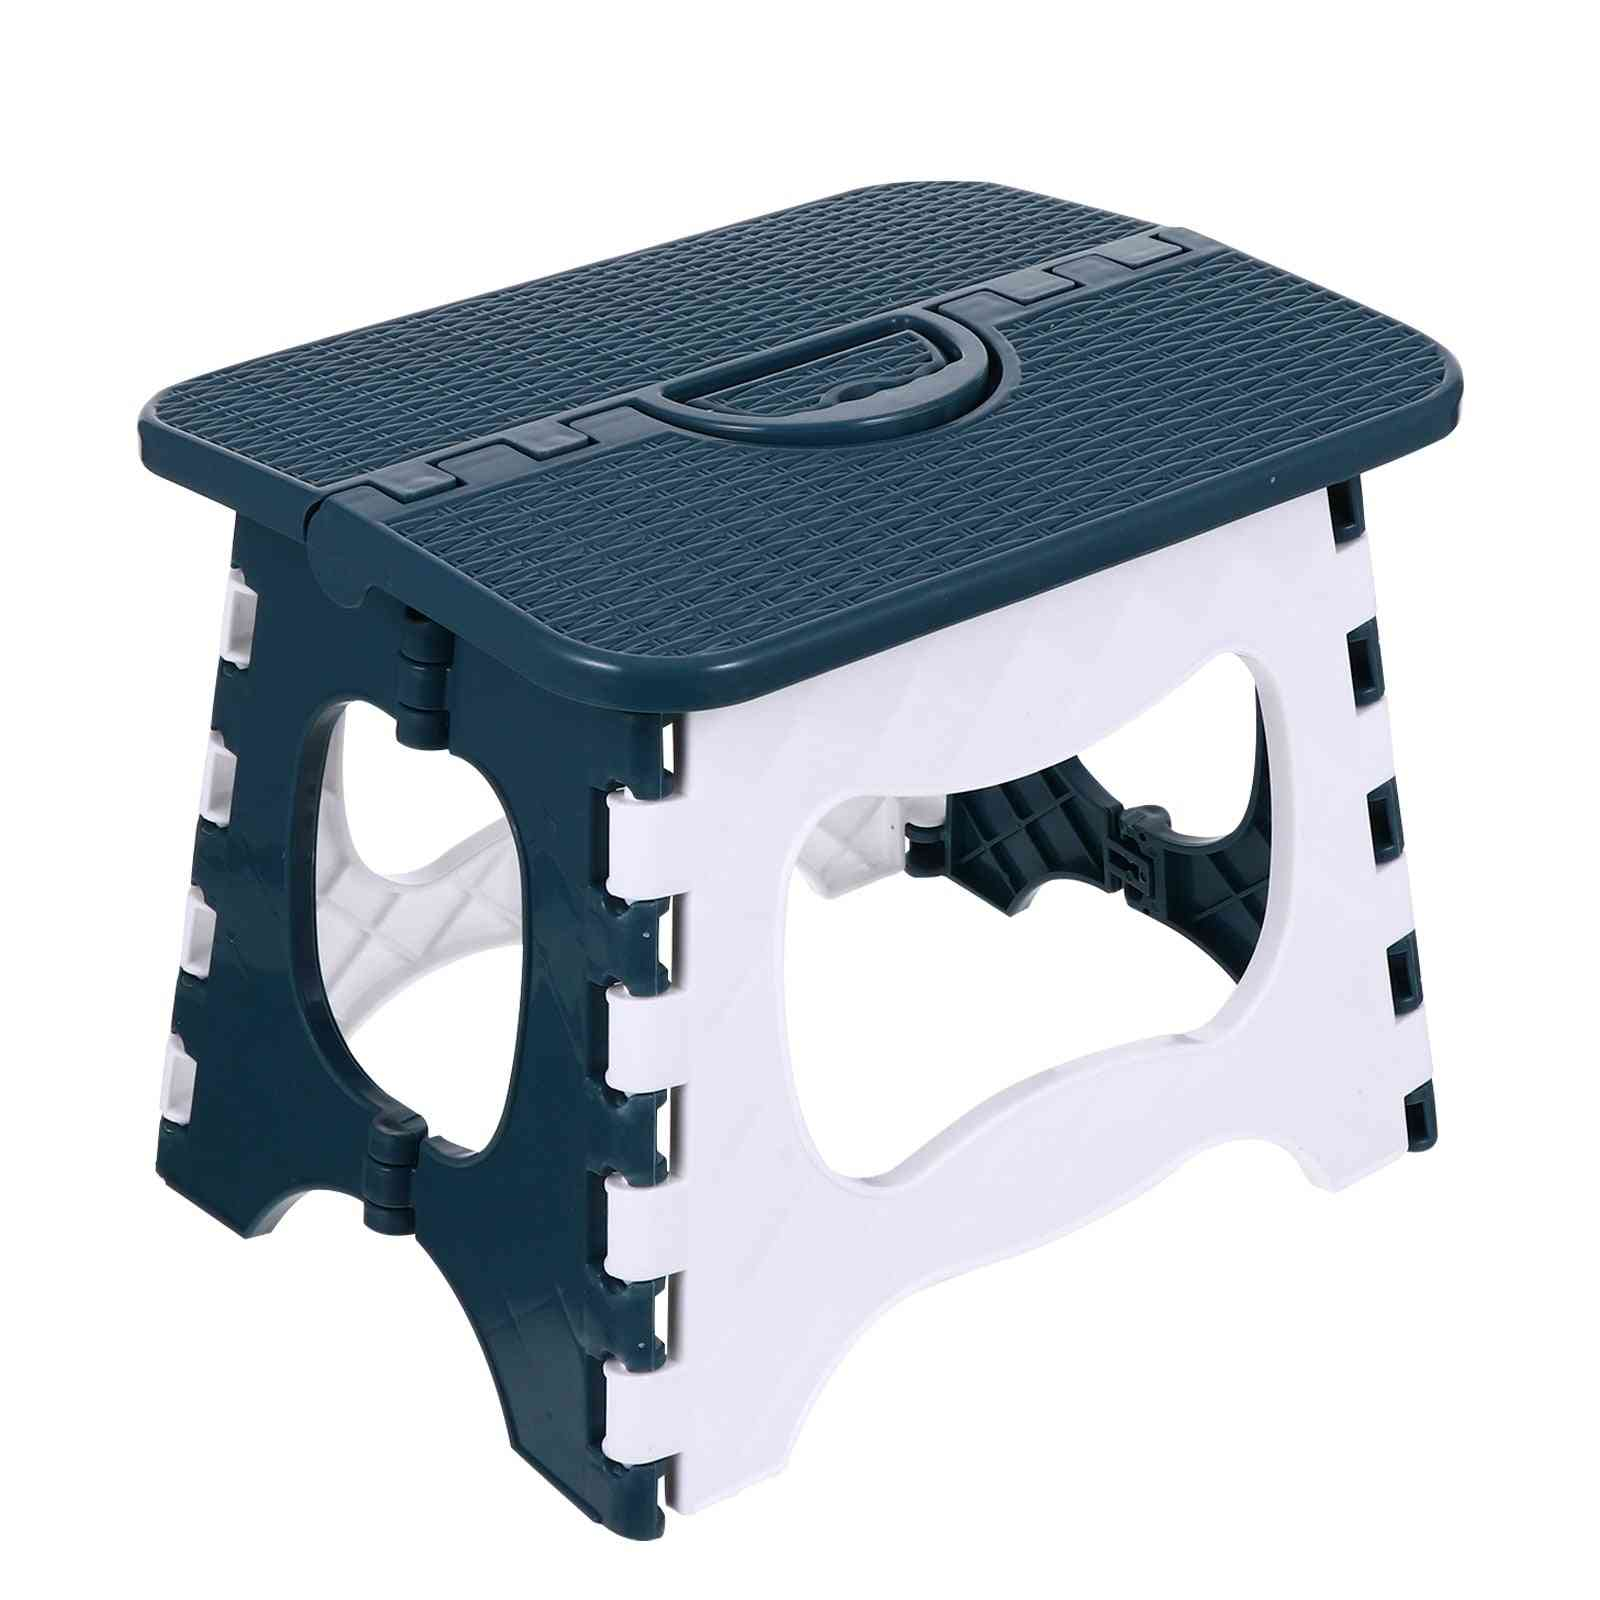 Plastic Folding Portable Step Stool